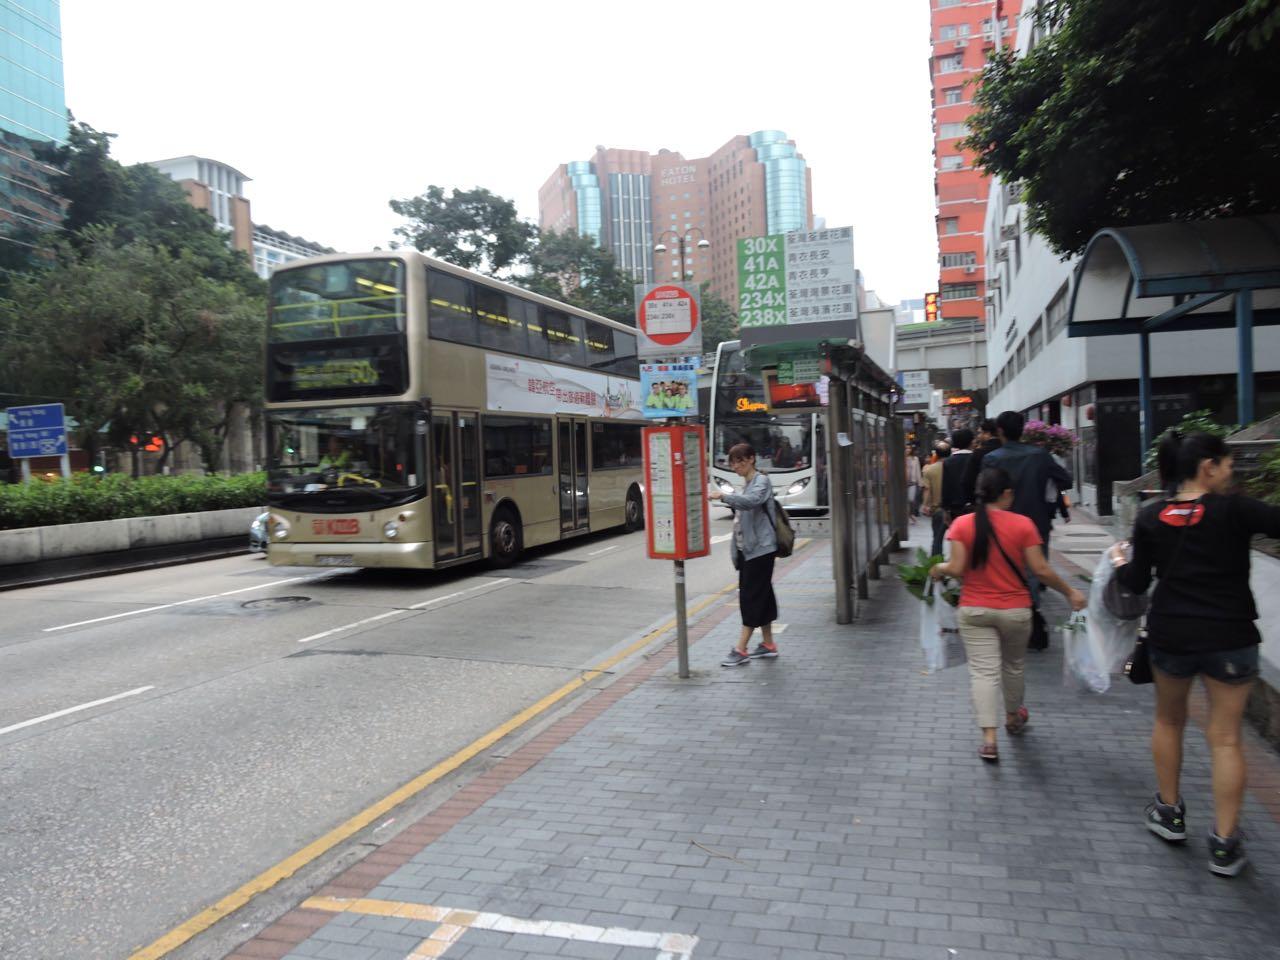 Hong Kong trasporti